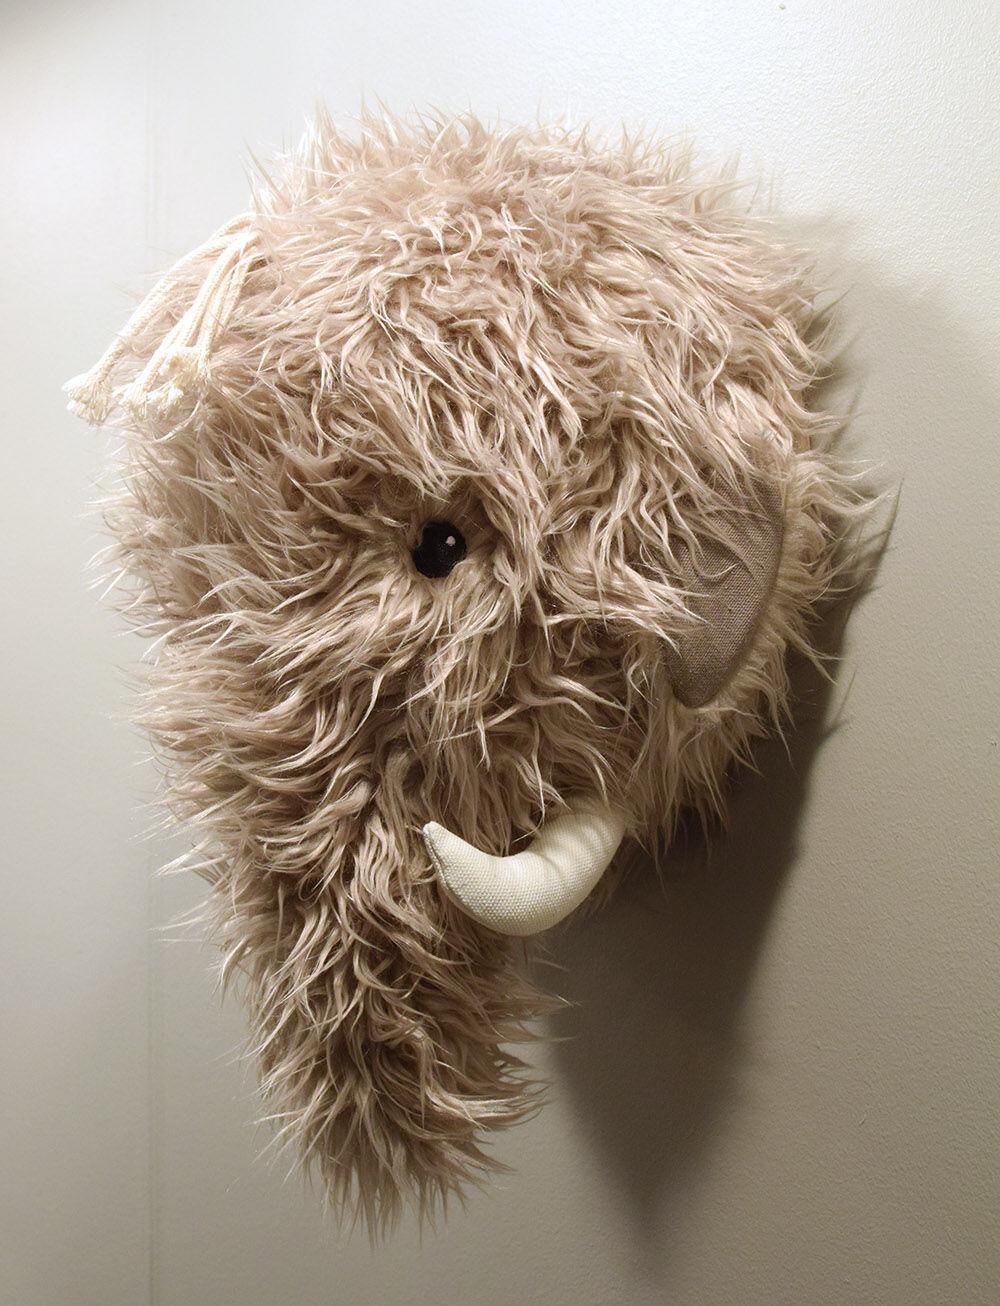 formex_2017_kids_room_mamut